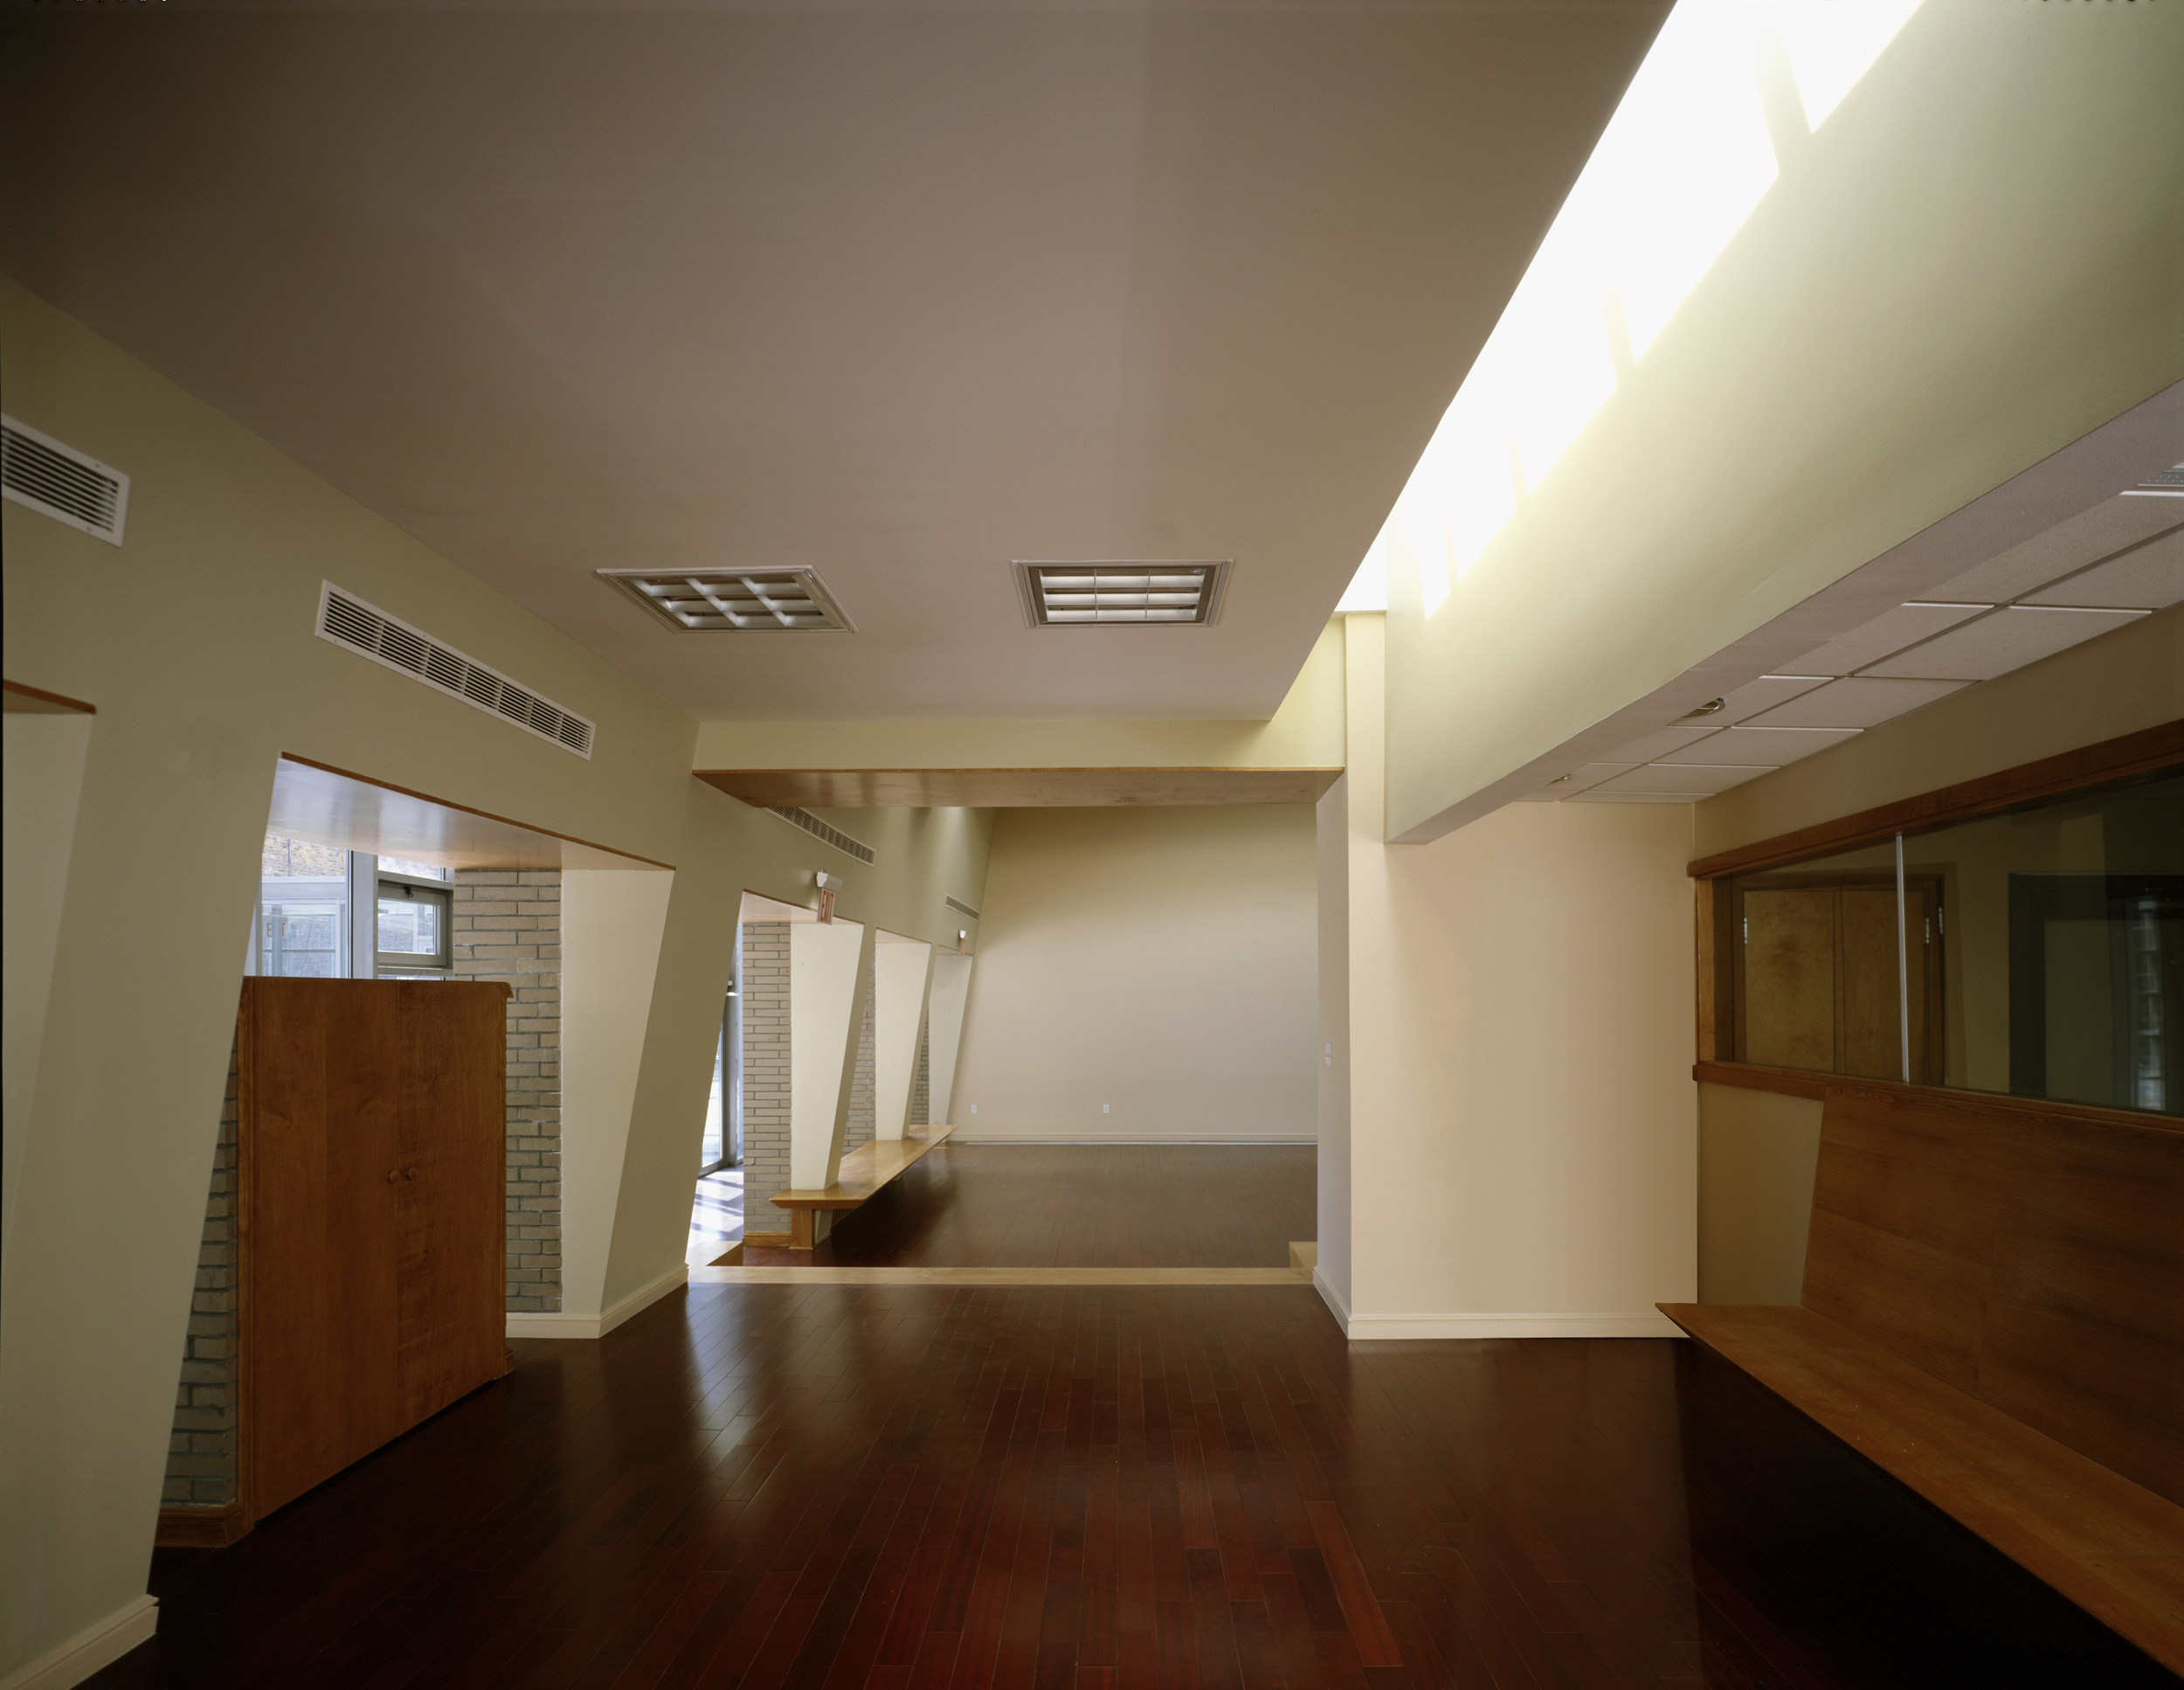 Billiard room looking towards meeting room